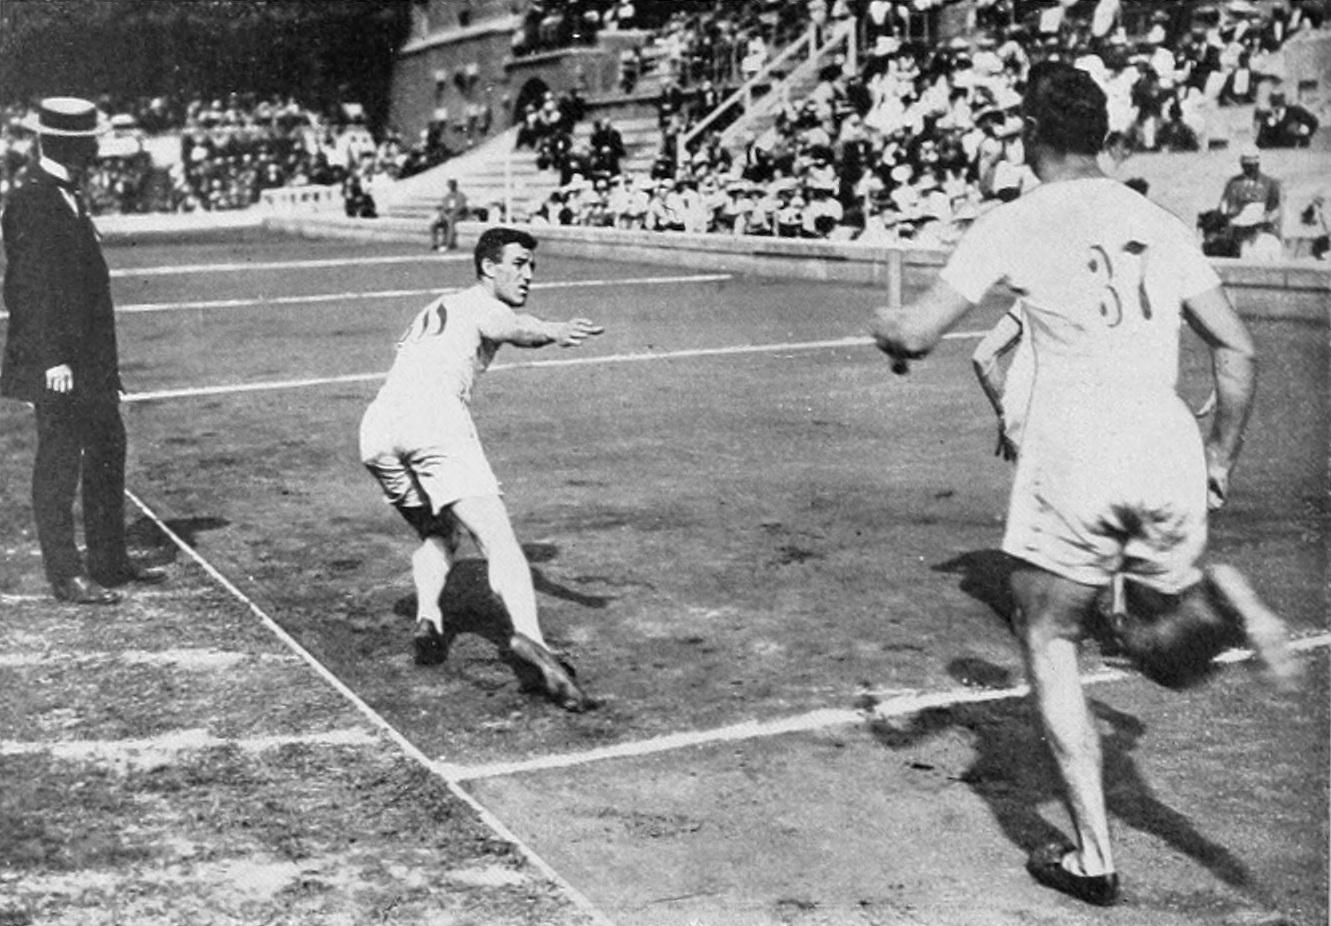 1912_Athletics_men's_4x400_metre.JPG